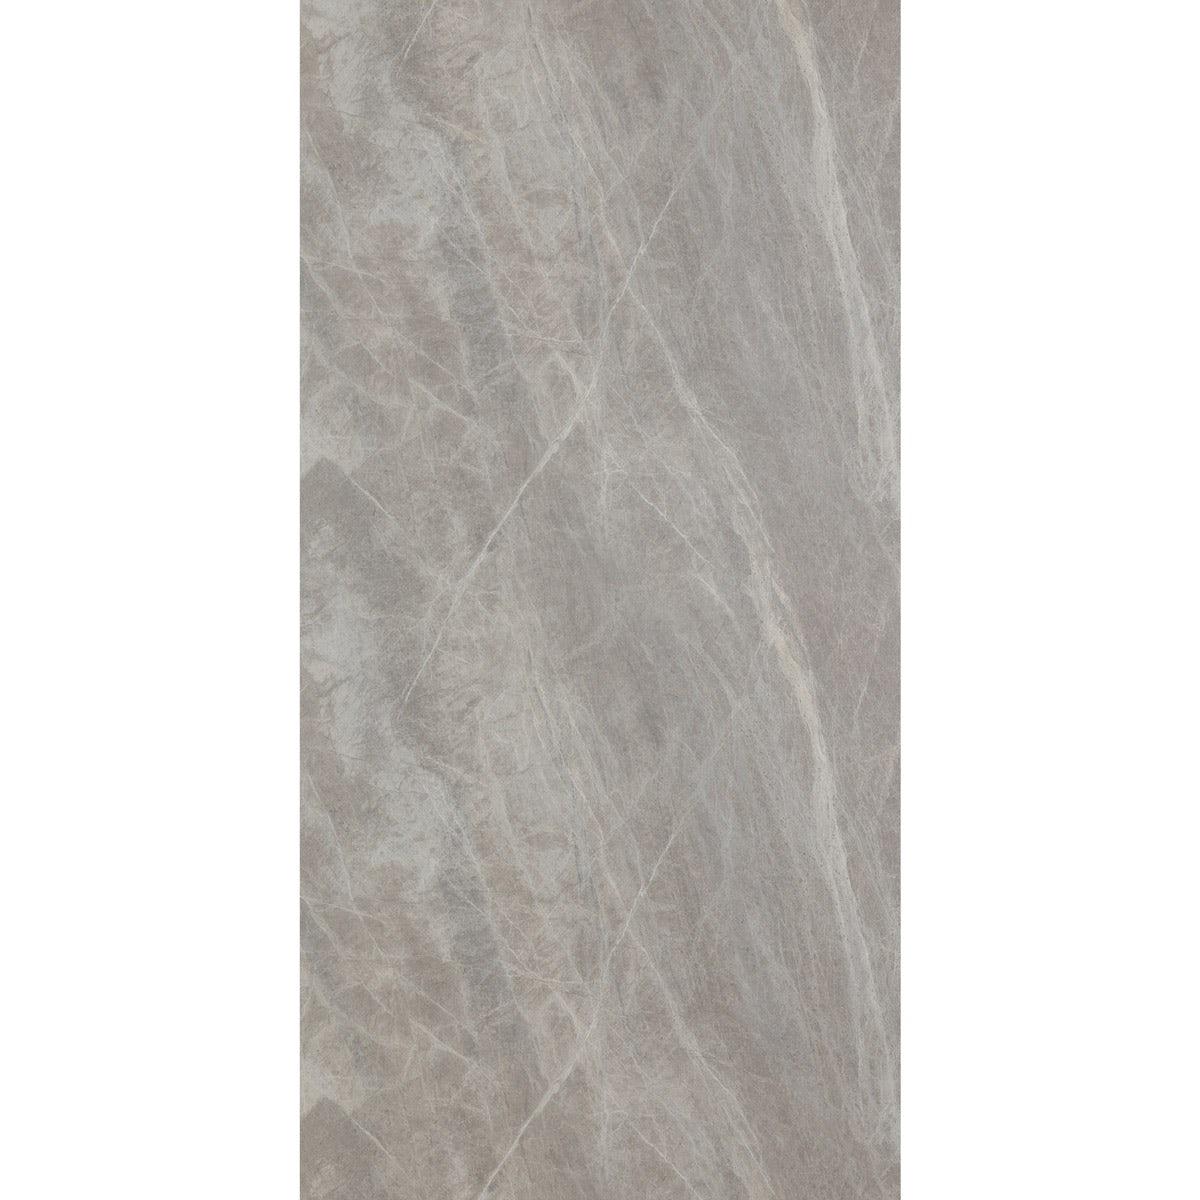 ... Multipanel Linda Barker Soapstone Stellar Hydrolock Shower Wall Panel  ...